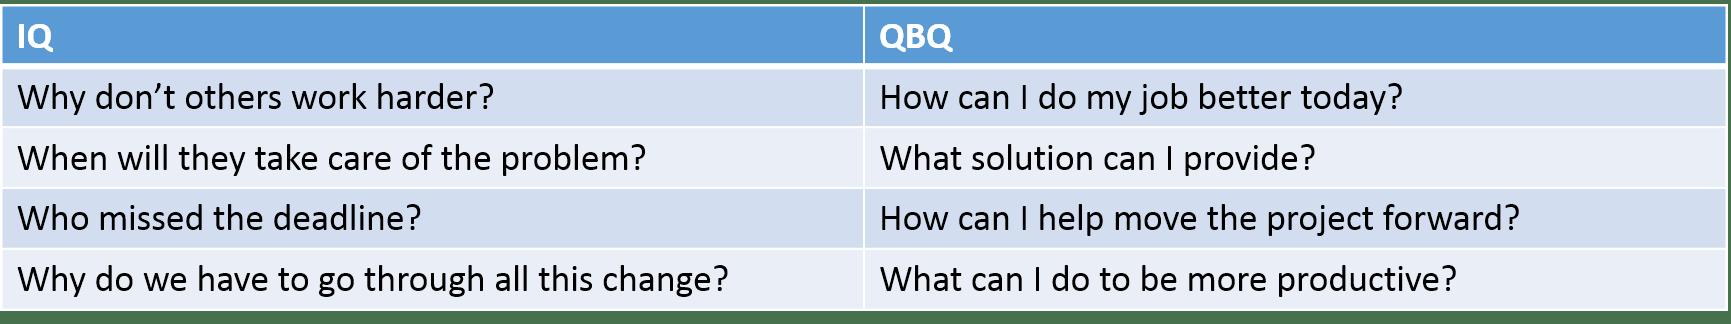 QBQ table